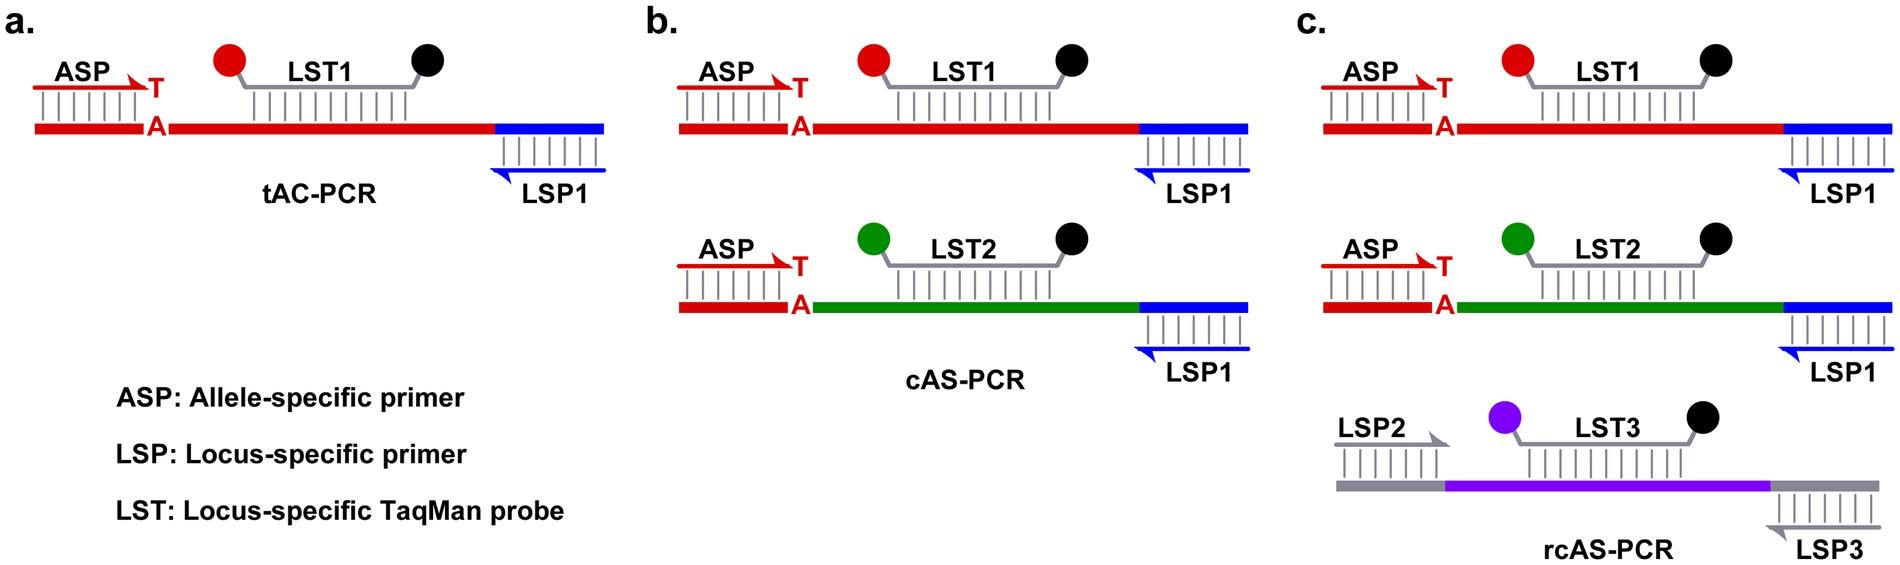 Improved detection of BRAF V600E using allele-specific PCR coupled